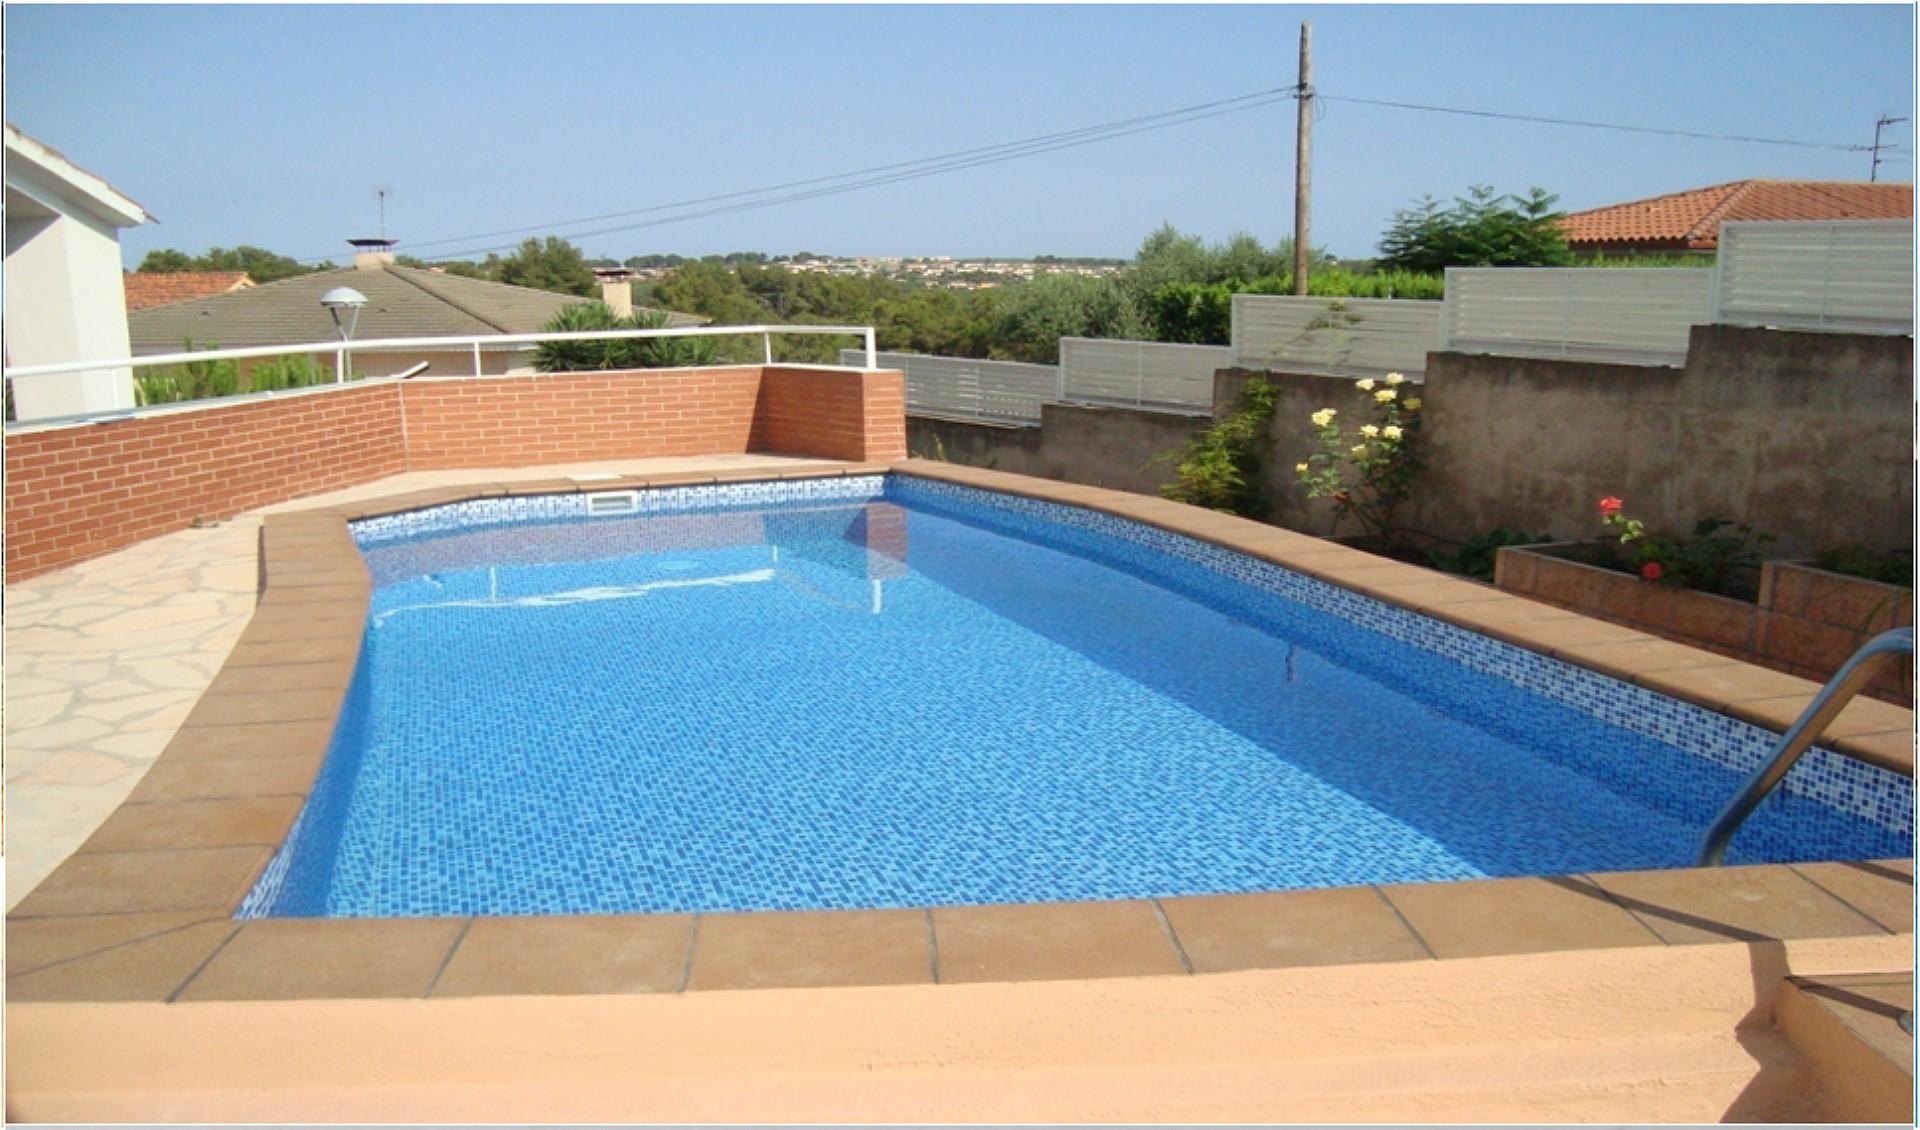 Piscinas reparaci n piscinas avila for Piscina guadarrama